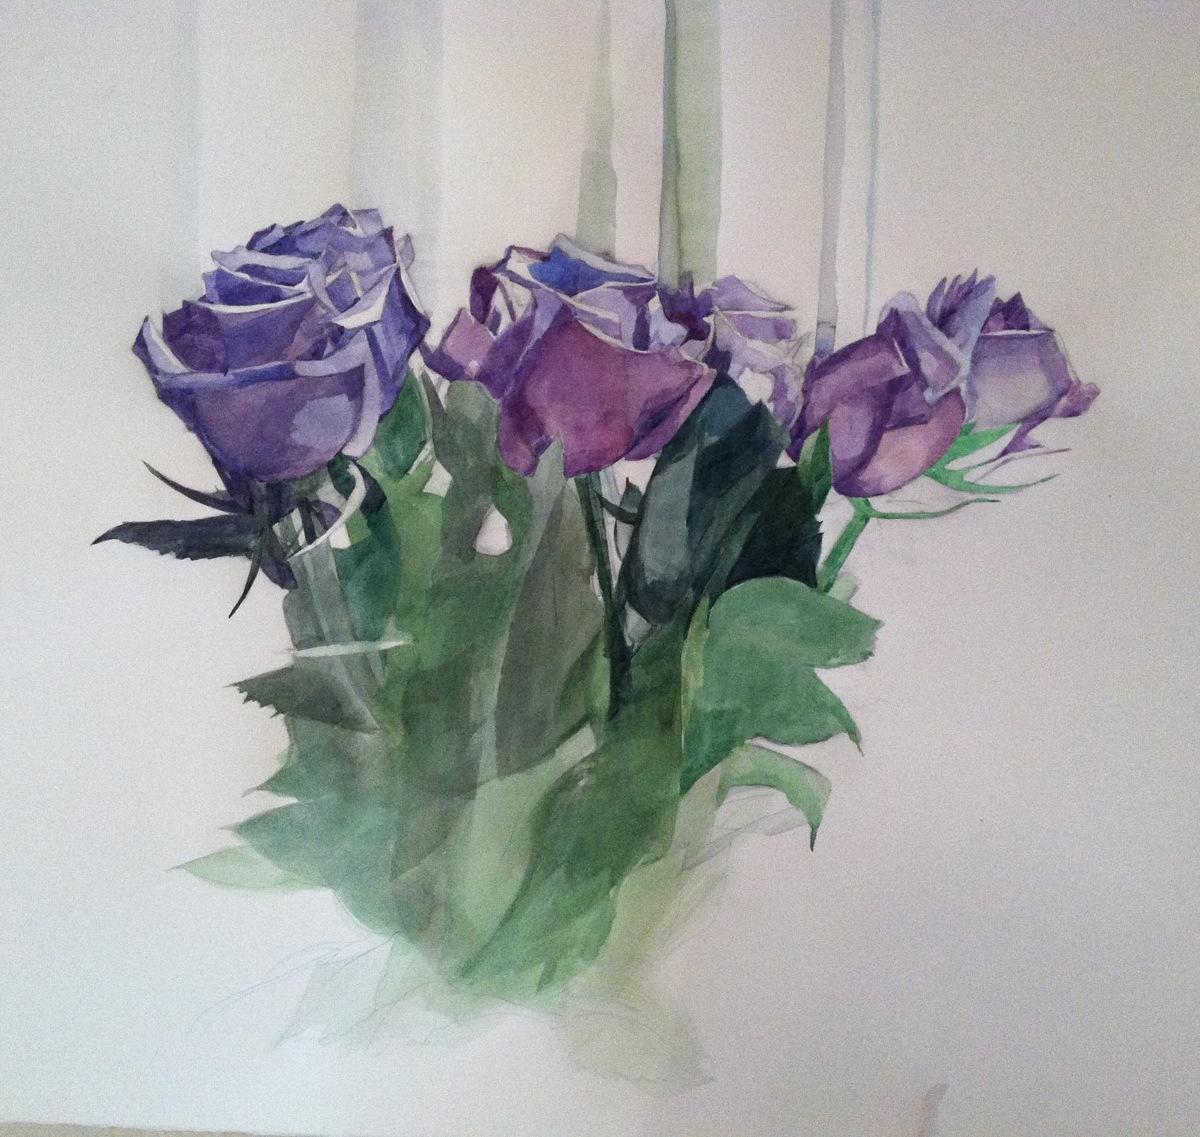 Purple Flowers (large view)